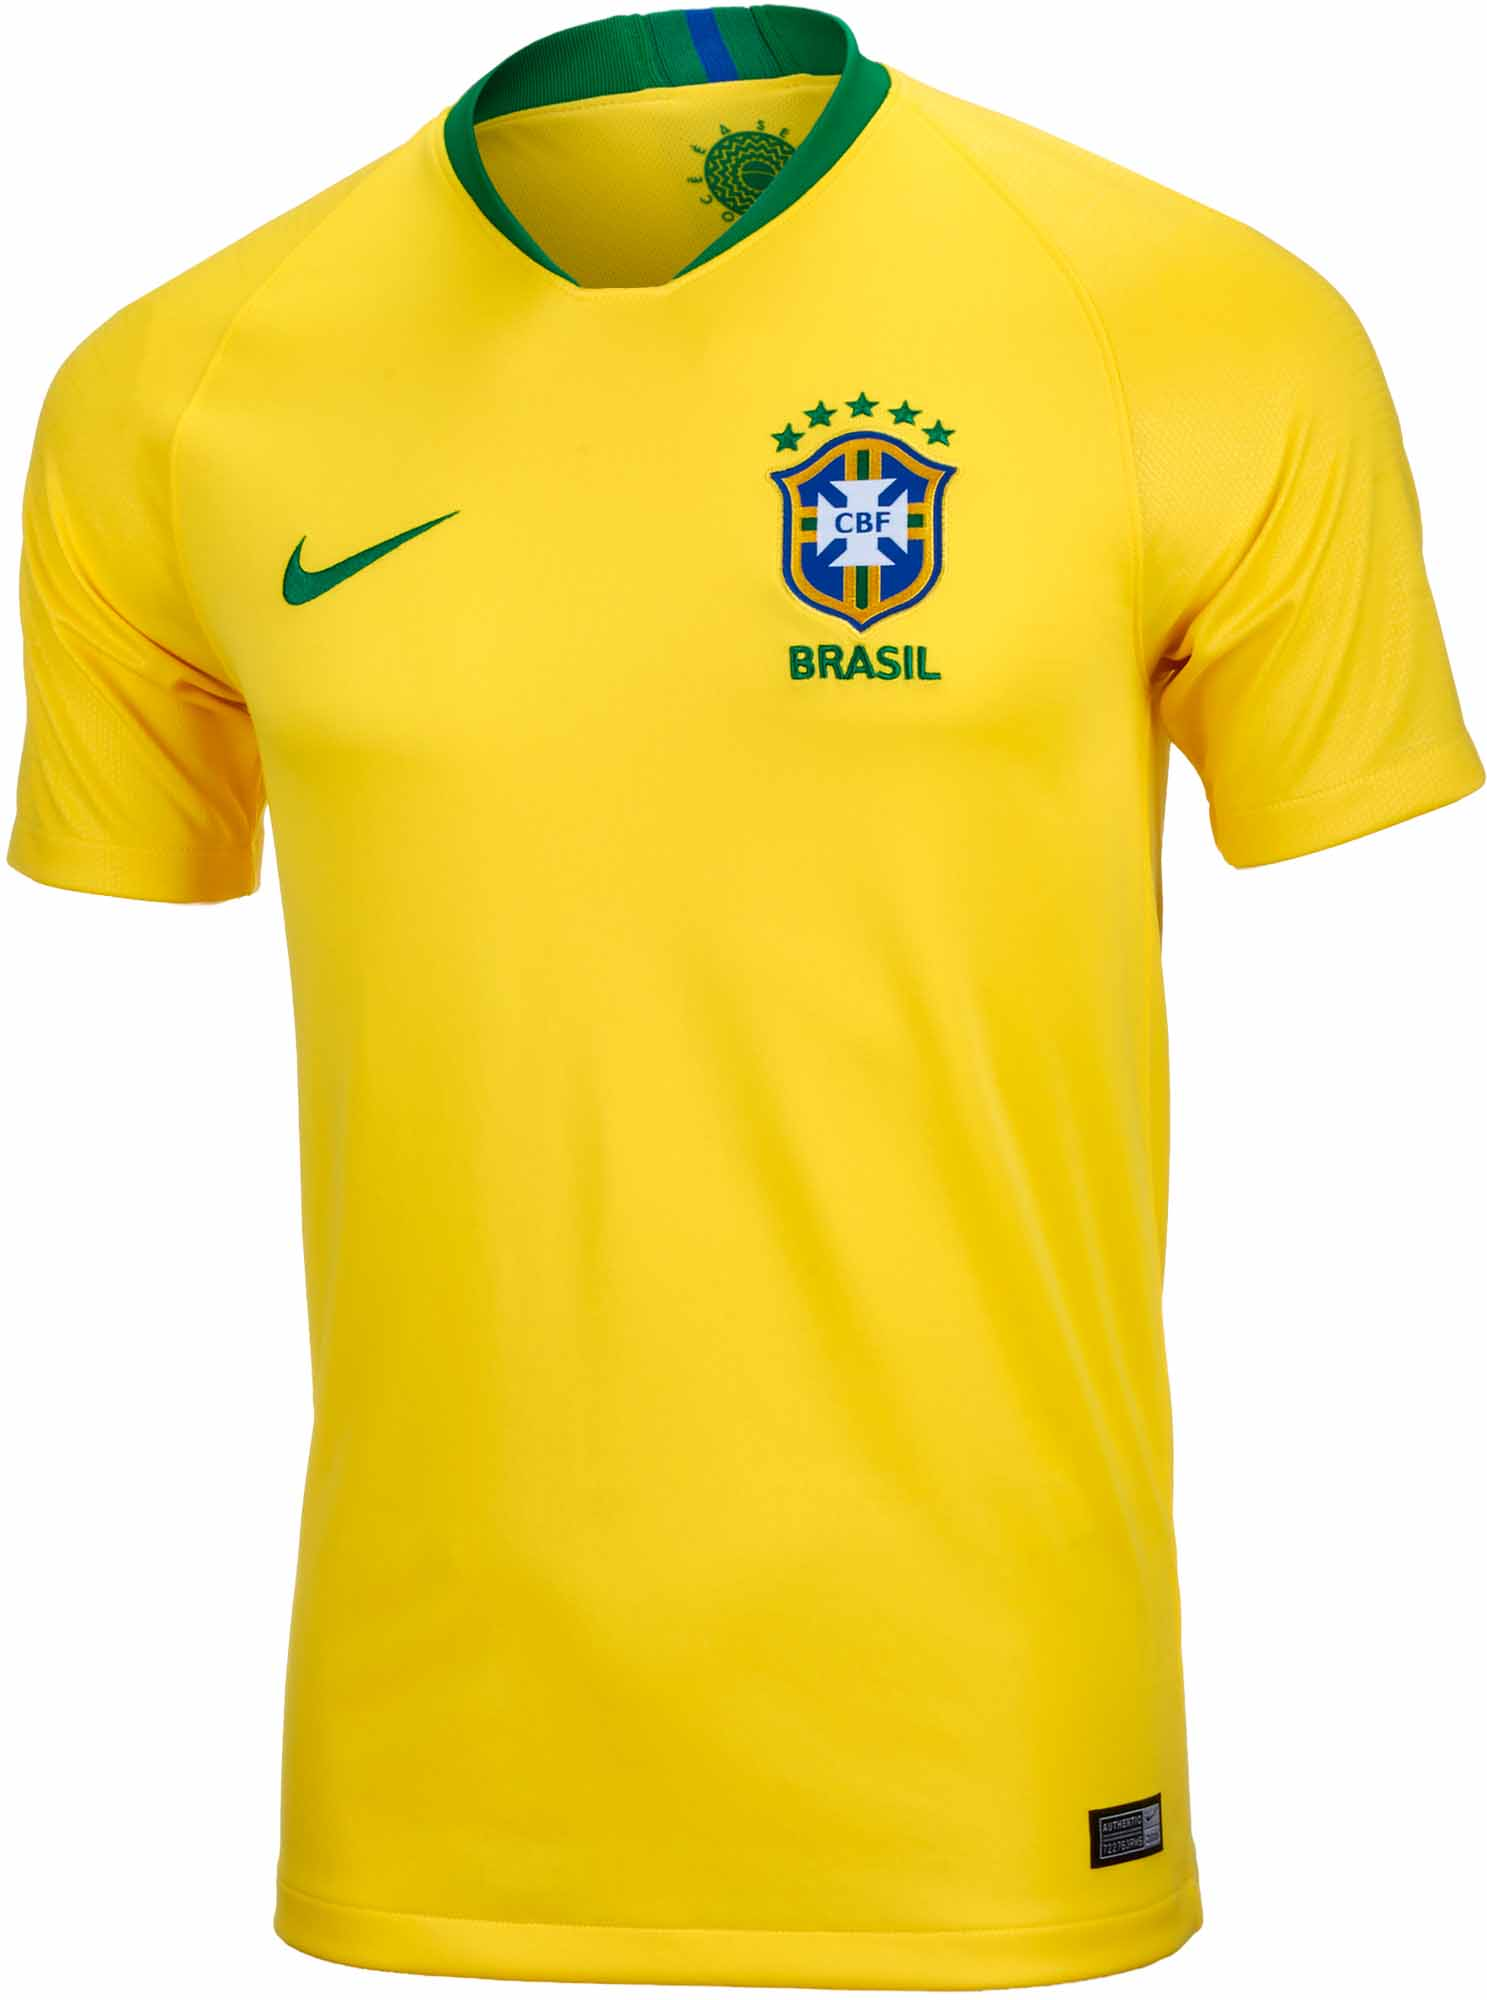 b8f98962f Nike Brazil Home Jersey - Youth 2018-19 NS - Soccer Master